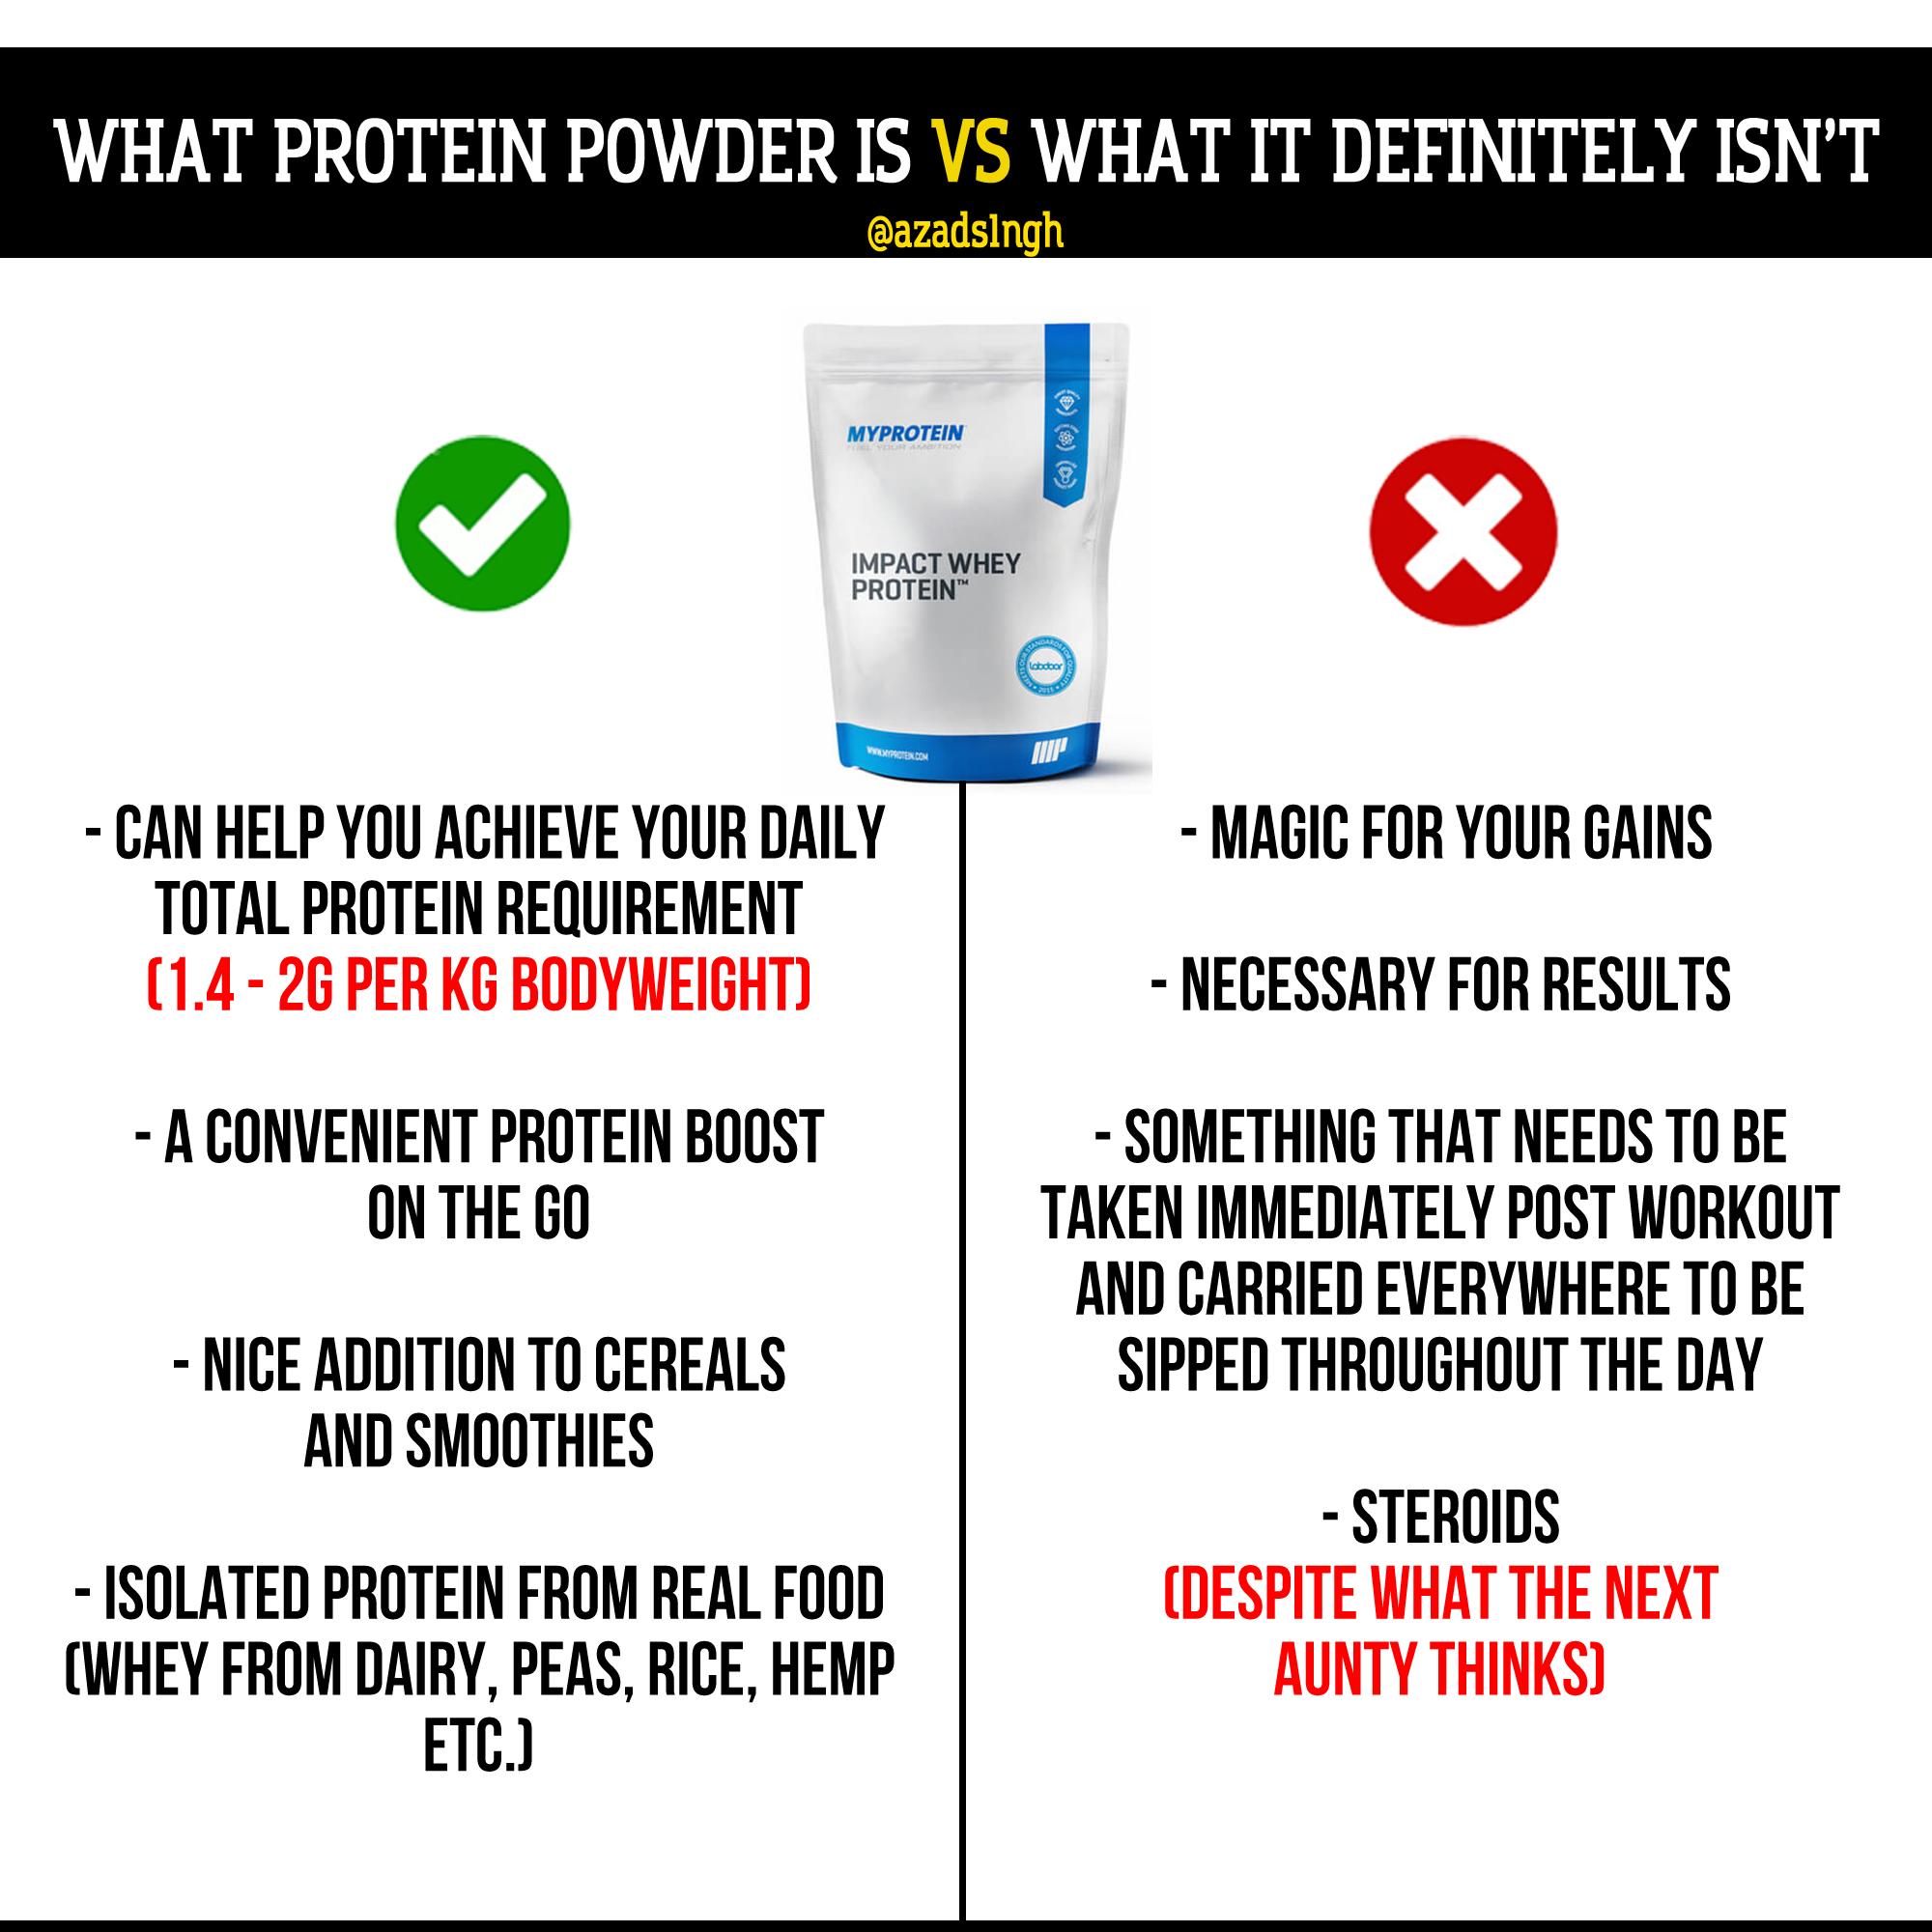 2g protein per kg